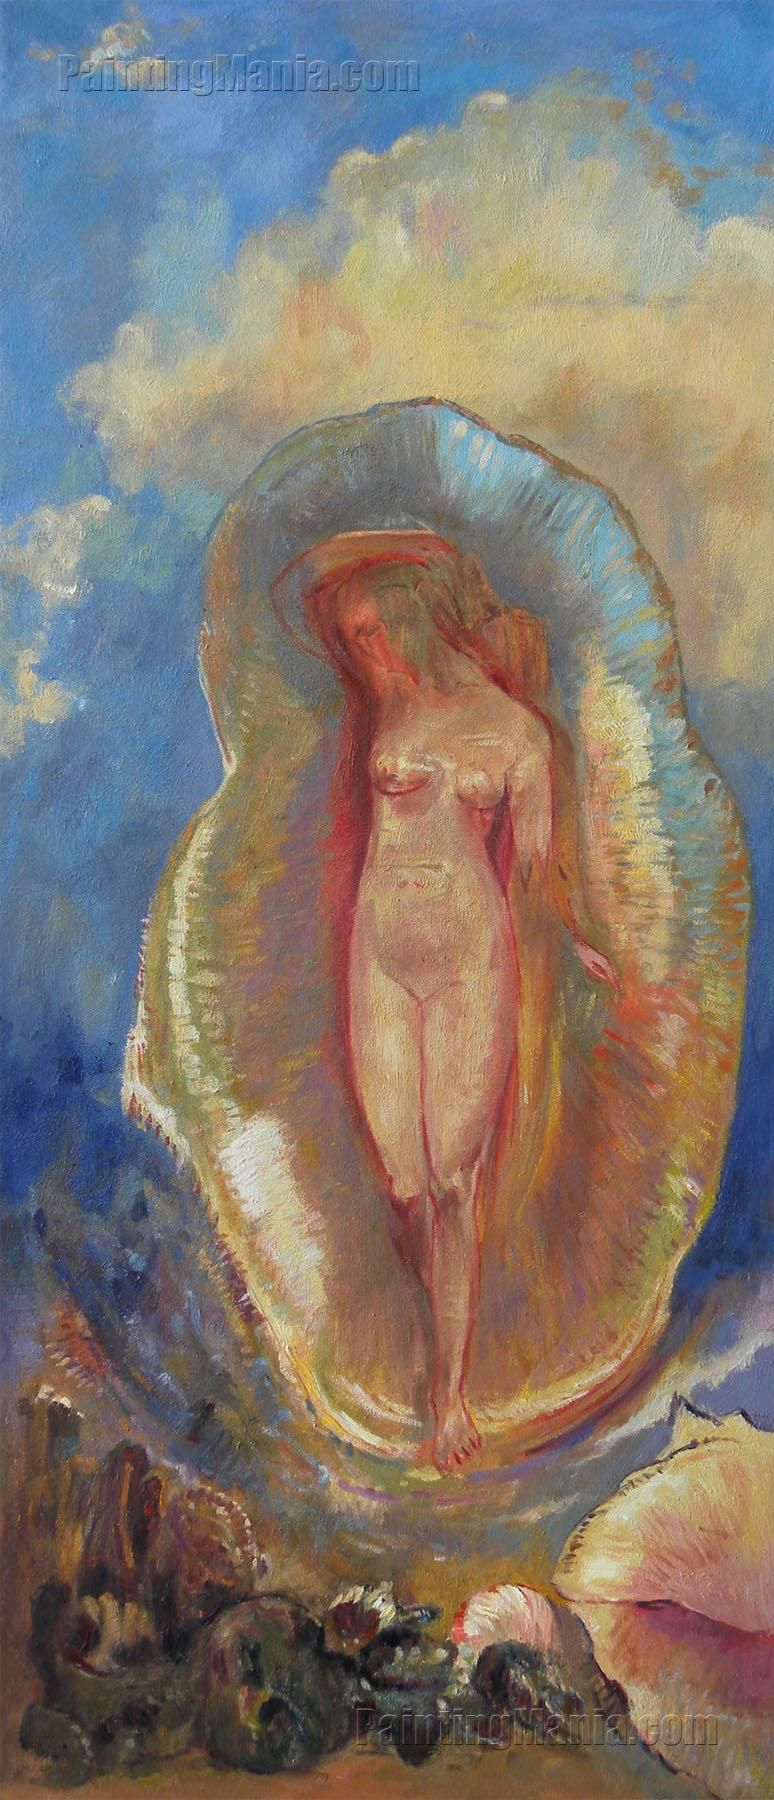 The Birth of Venus 4 by Odilon Redon   ODILON REDON   Pinterest ...